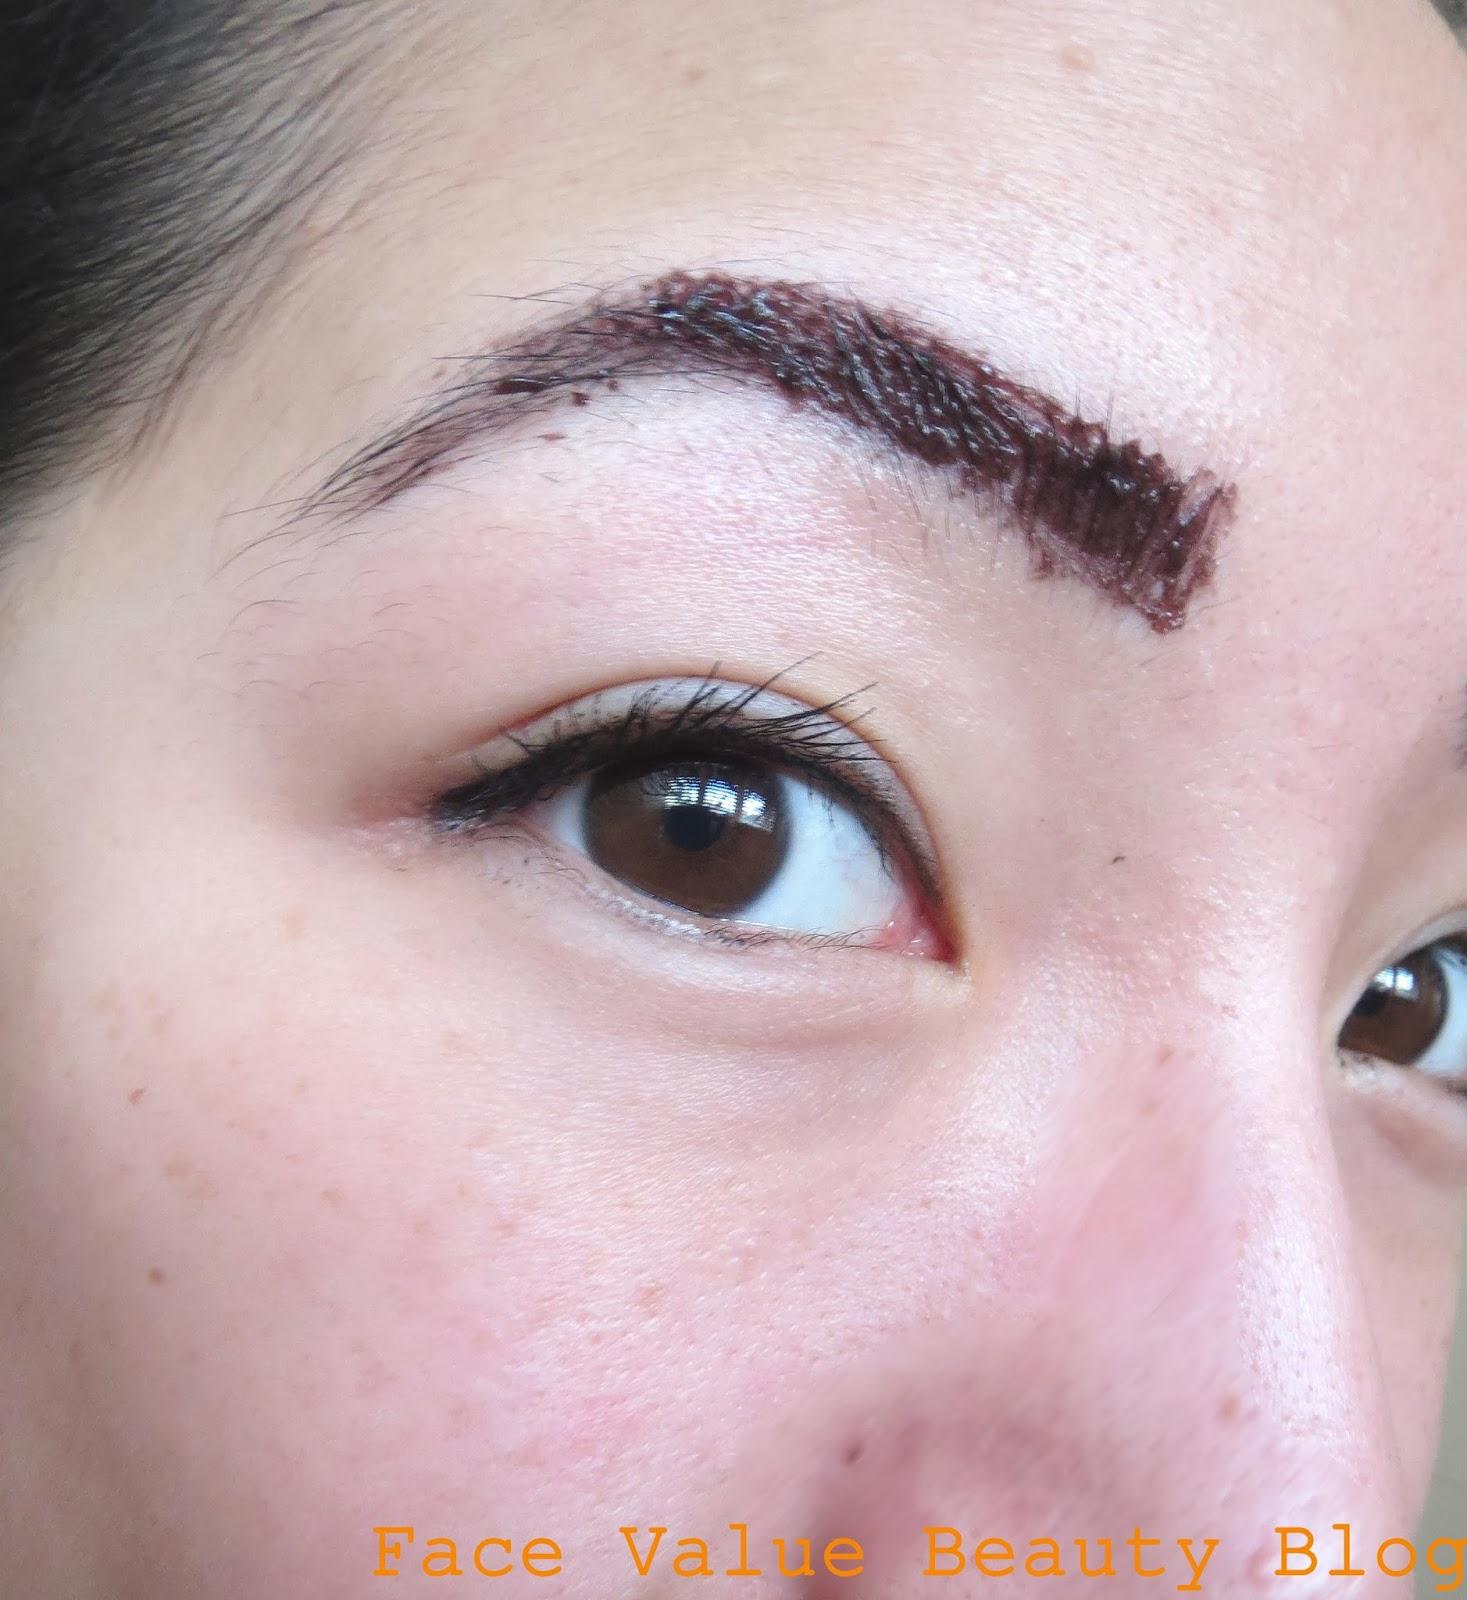 Face Value Beauty Blog: Barefaced Confidence Part1 : A DIY Brow ...